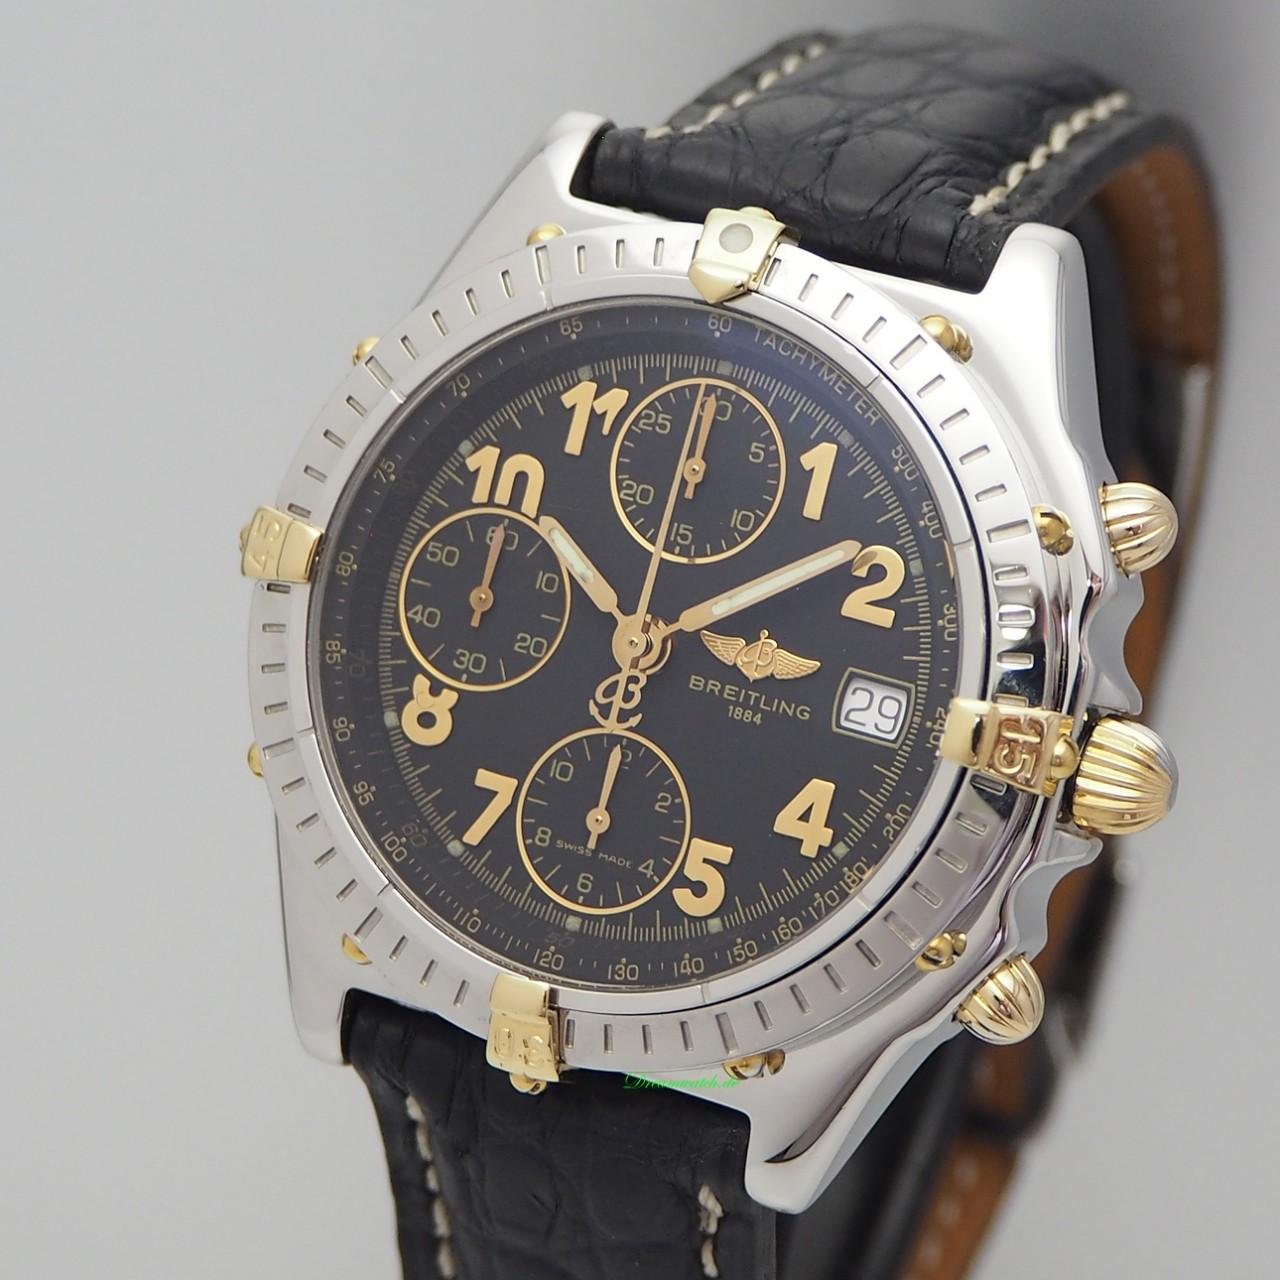 Breitling Windrider Chronomat Chronograph Stahl/ Gold, B13050.1, Box+Papiere